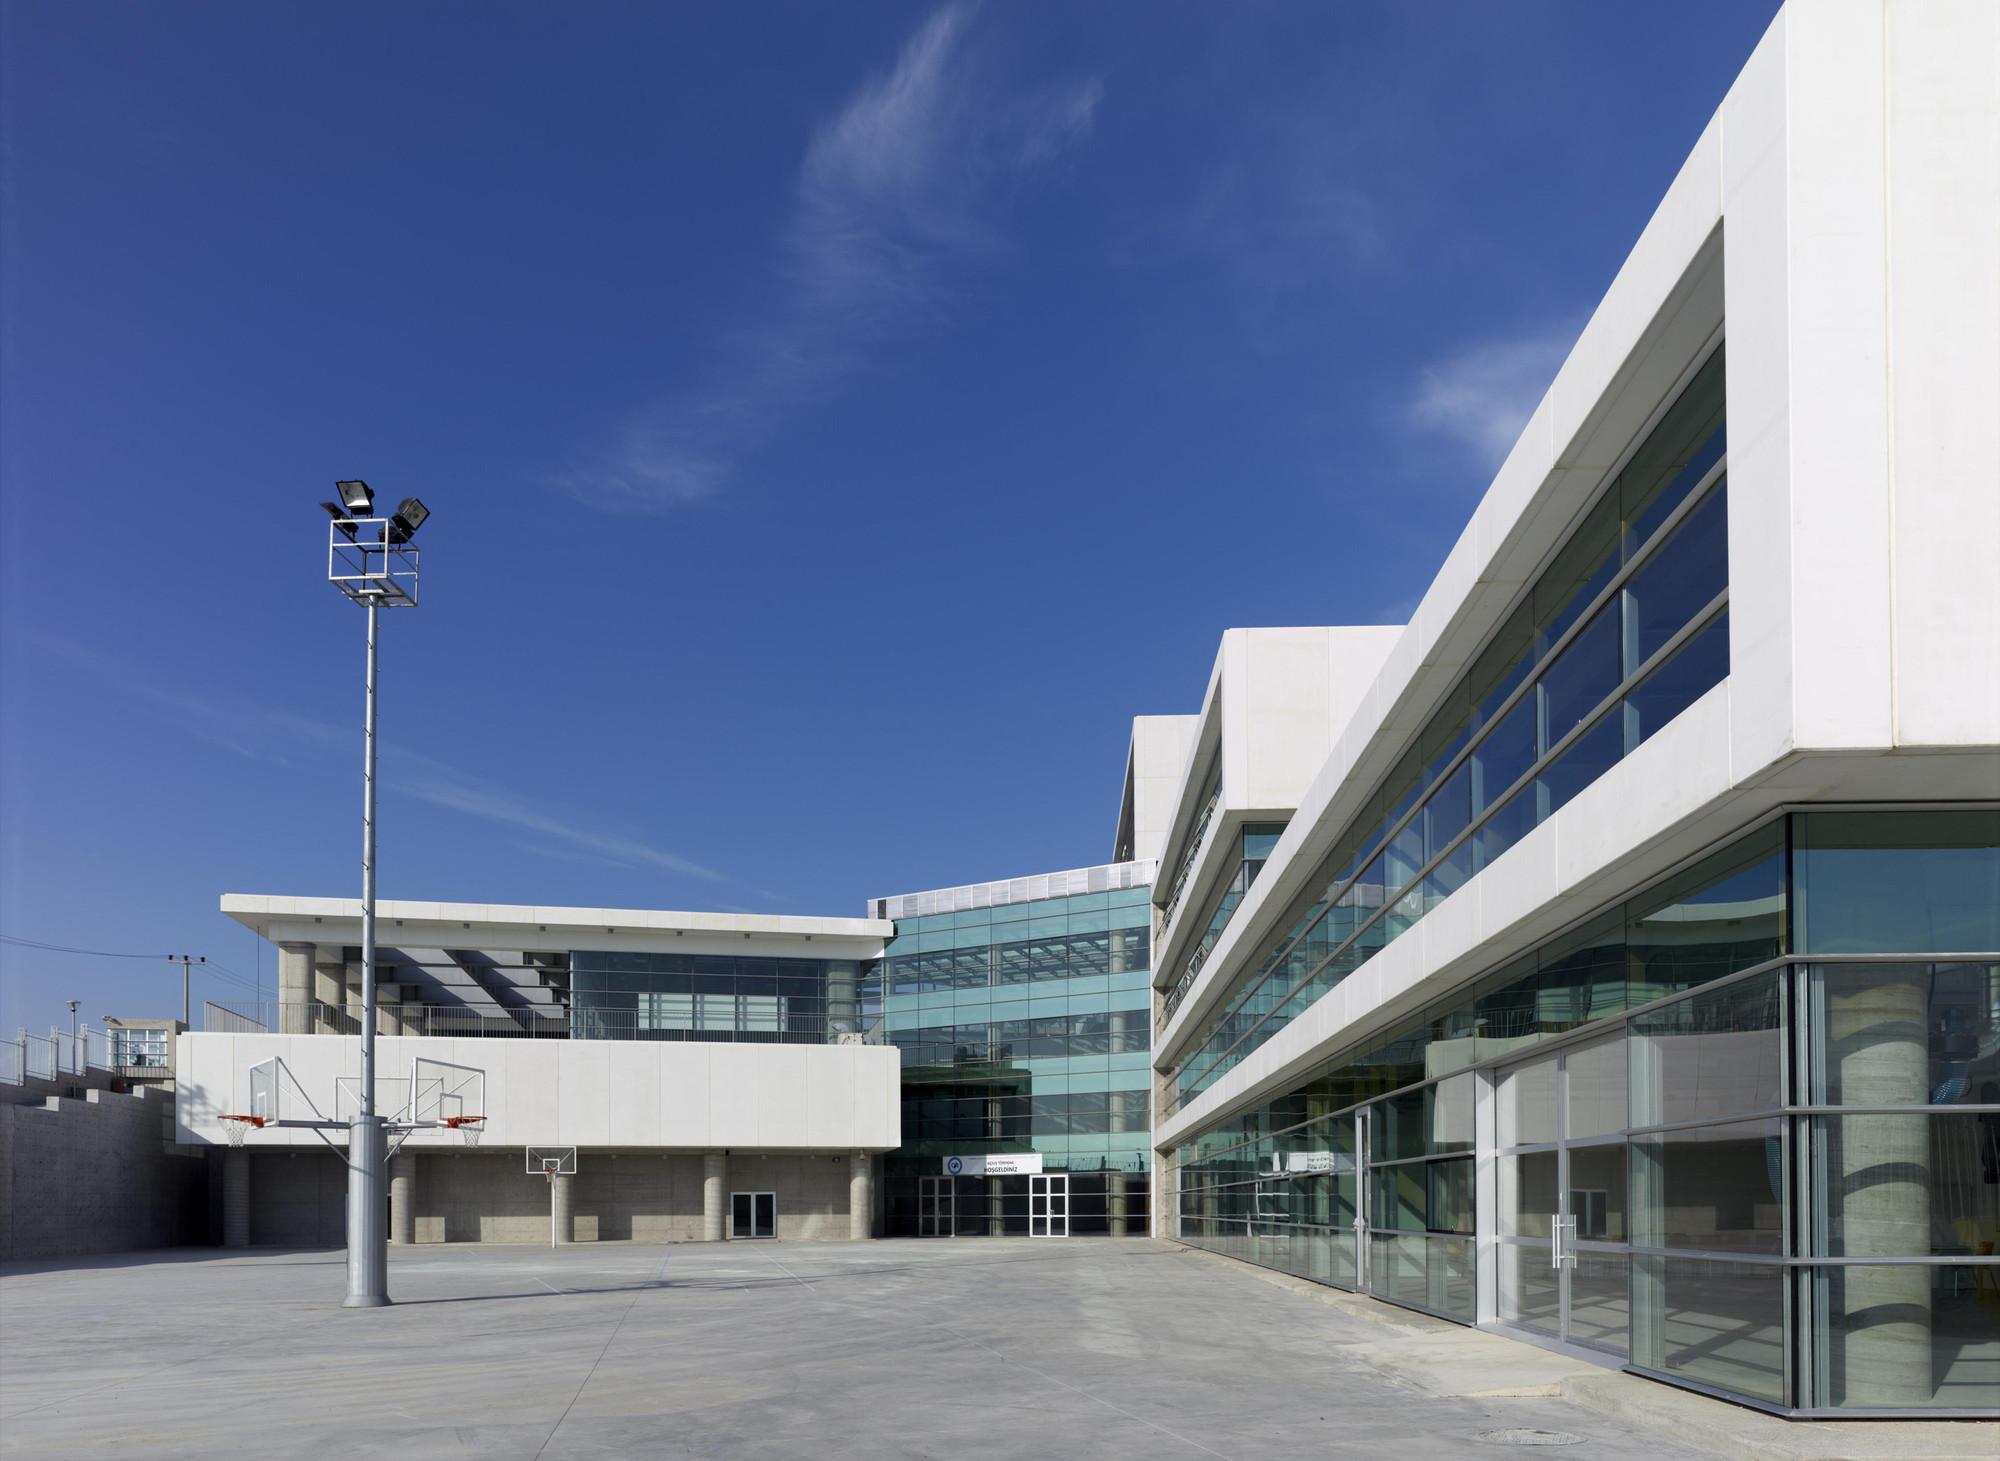 Auotmative Industry Exporters Union Technical and Industrial High School / Oficina Asma Bahçeleri Houses